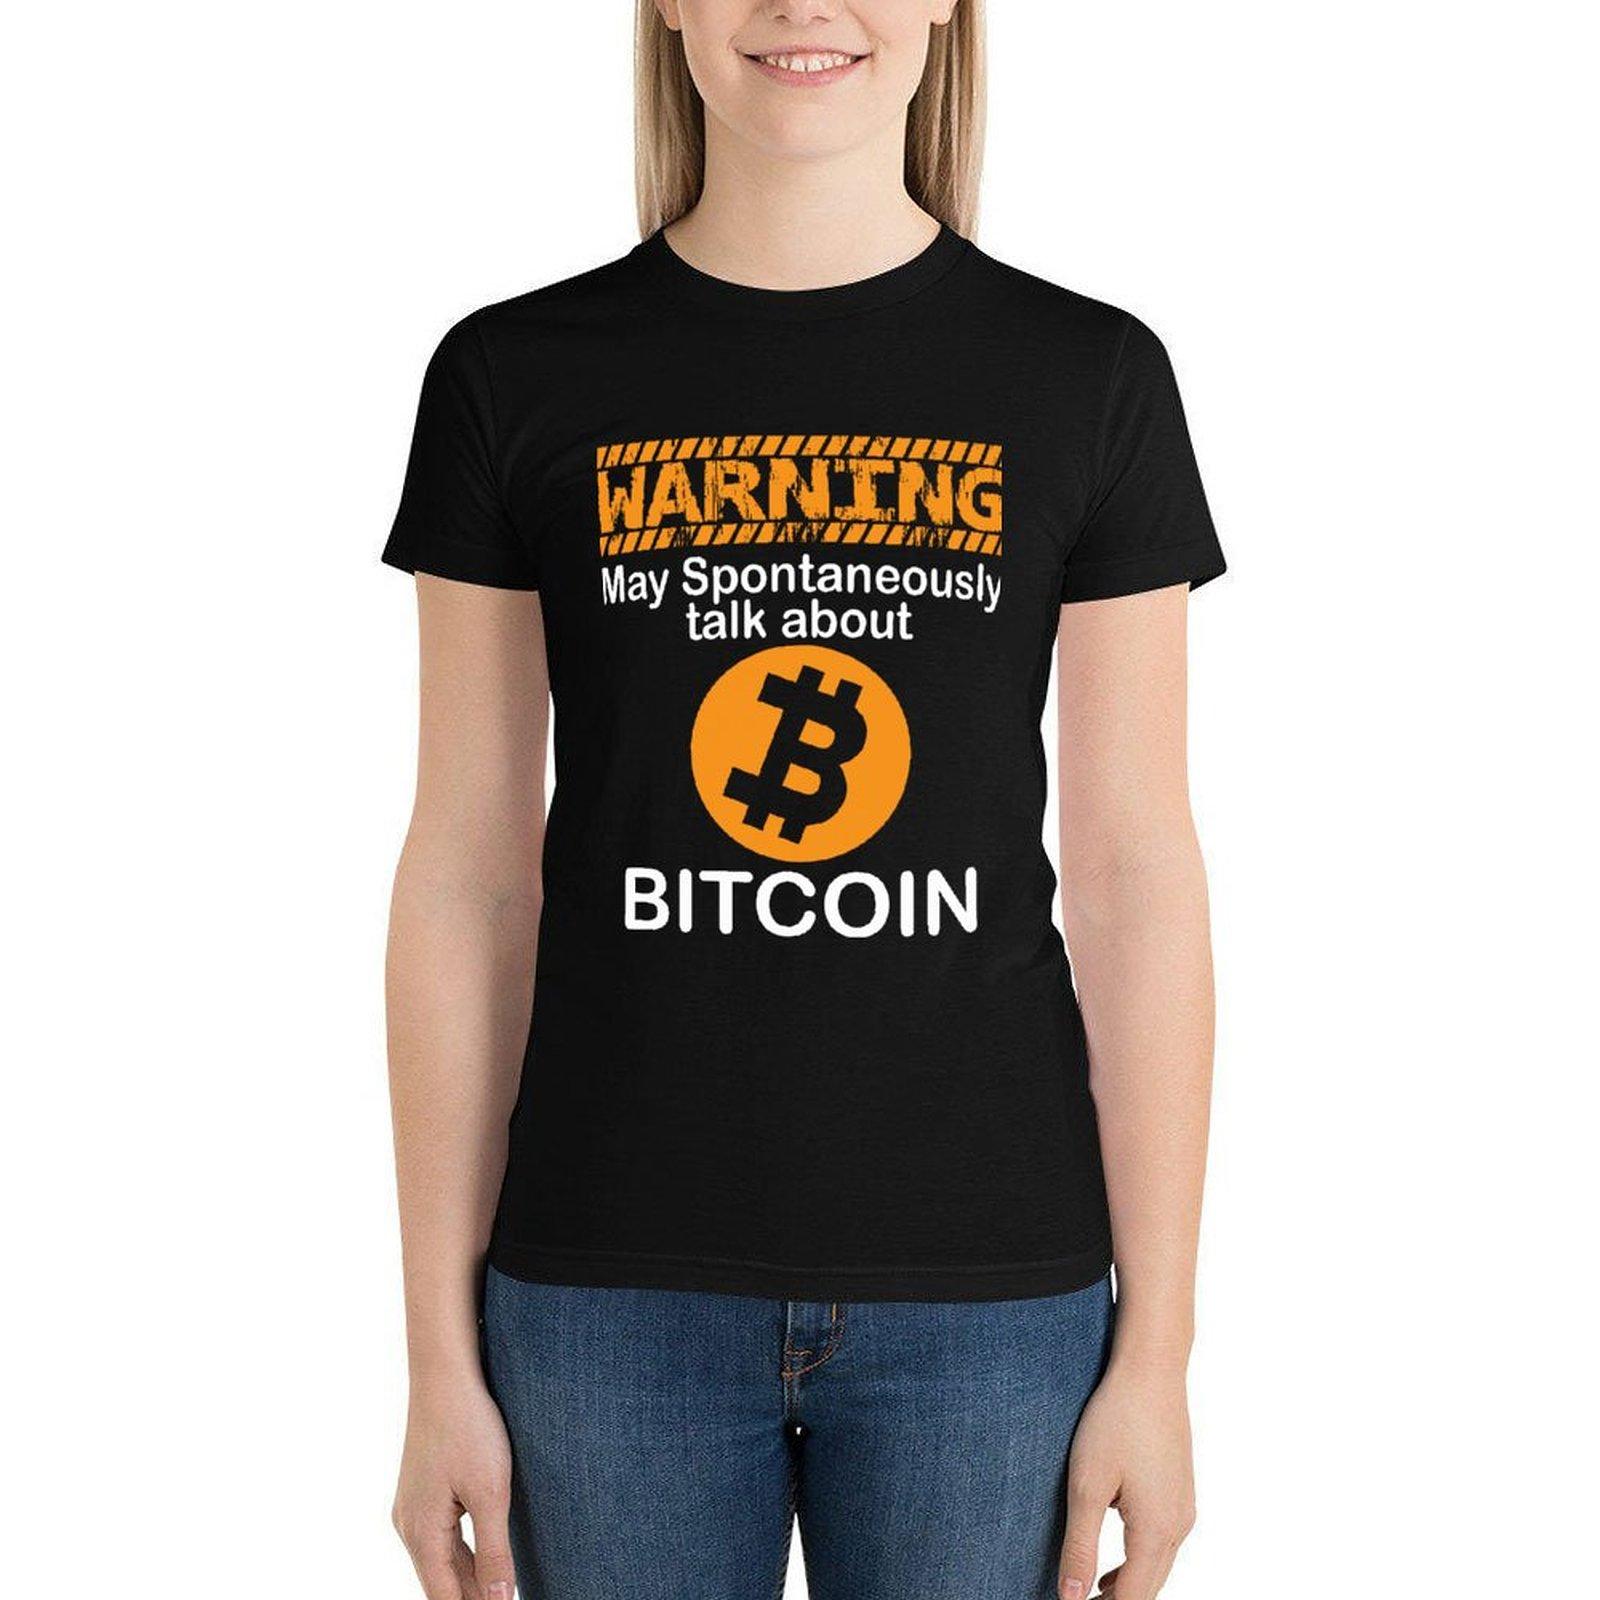 Bitcoin Tshirt Short-Sleeve Womens Cotton T Shirt Summer O Neck Graphic New Fashion Tee Shirt XXL 1